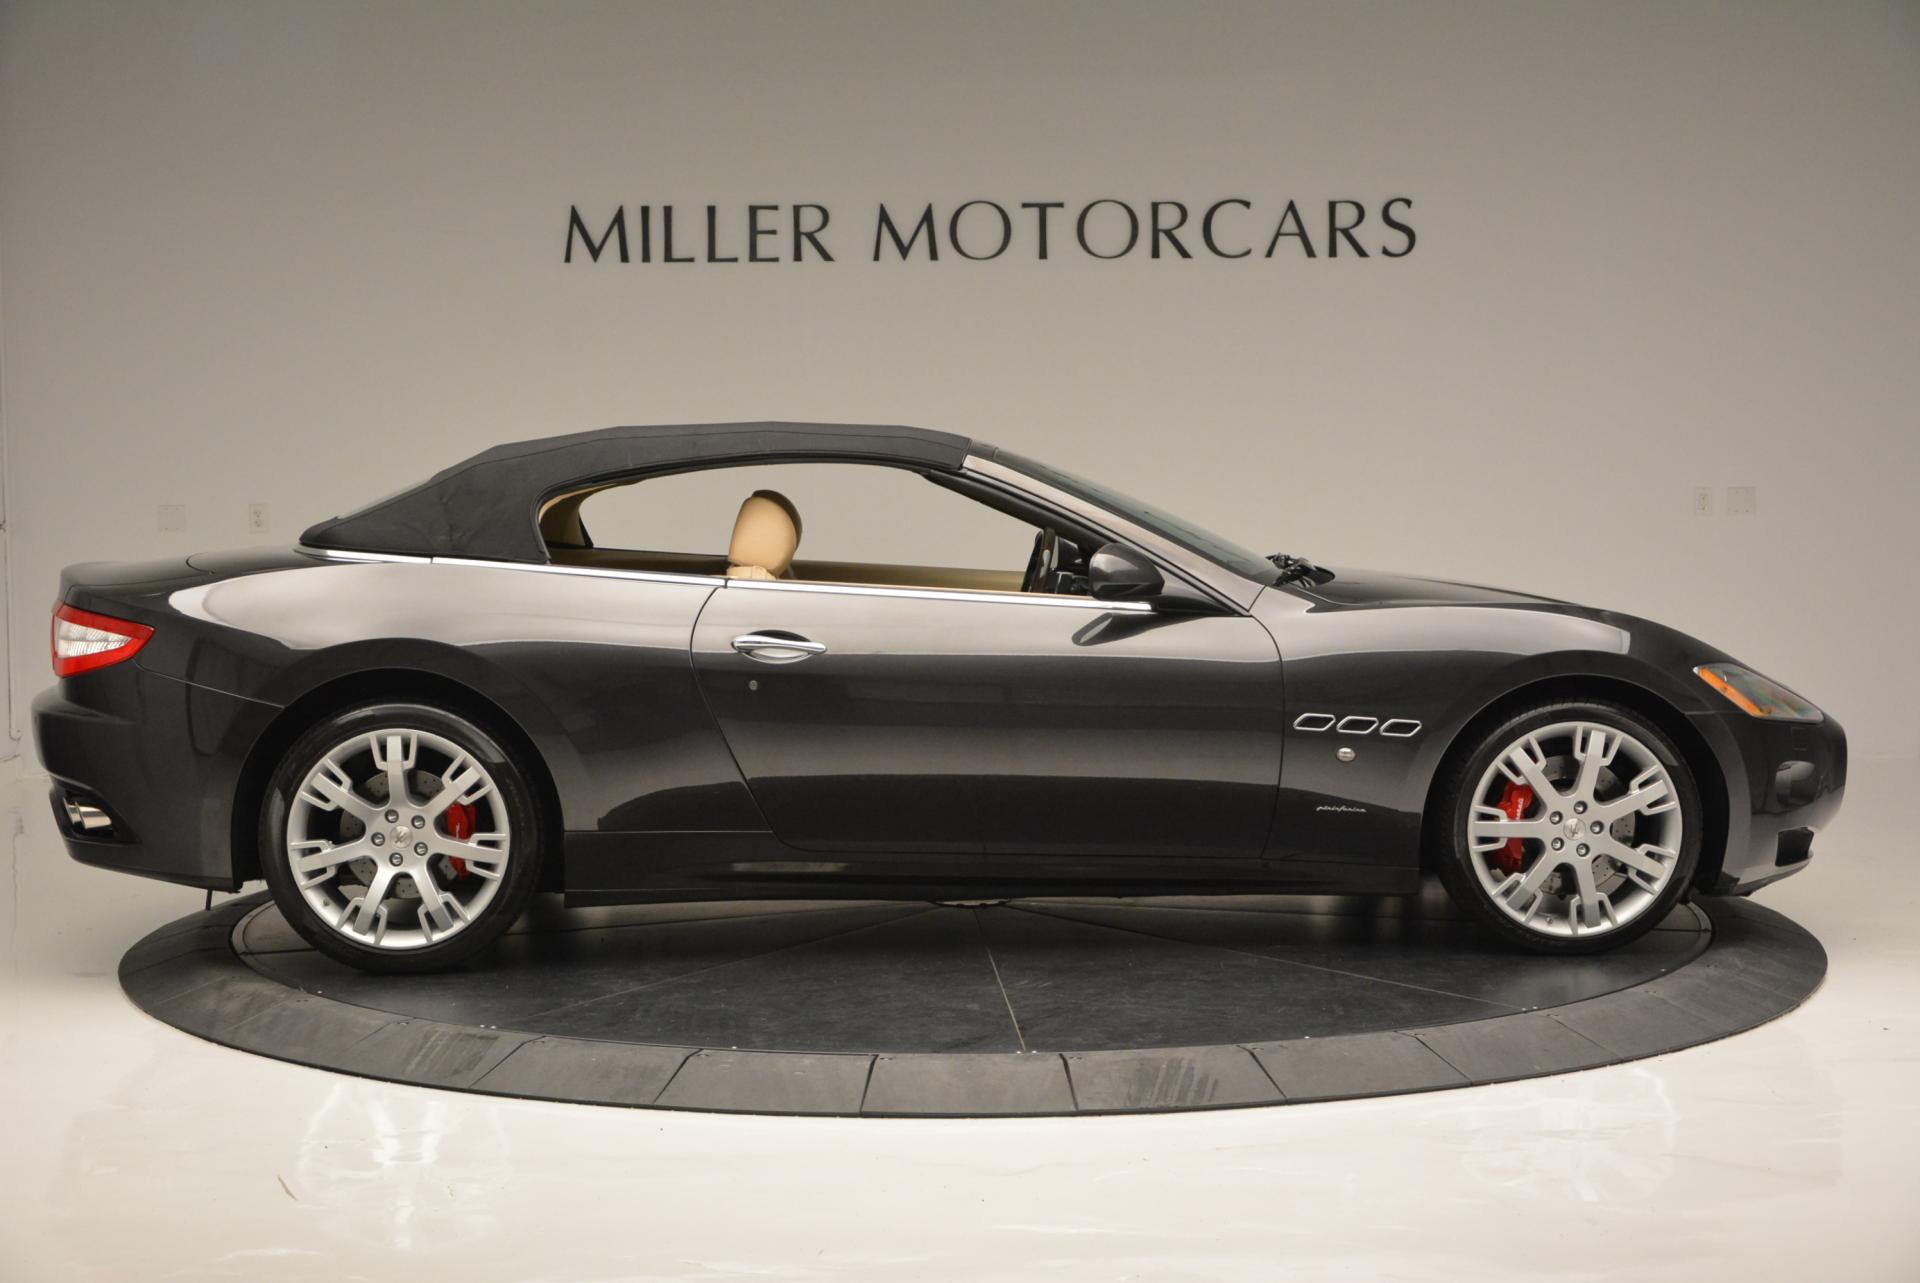 Used 2011 Maserati GranTurismo Base For Sale In Westport, CT 158_p21